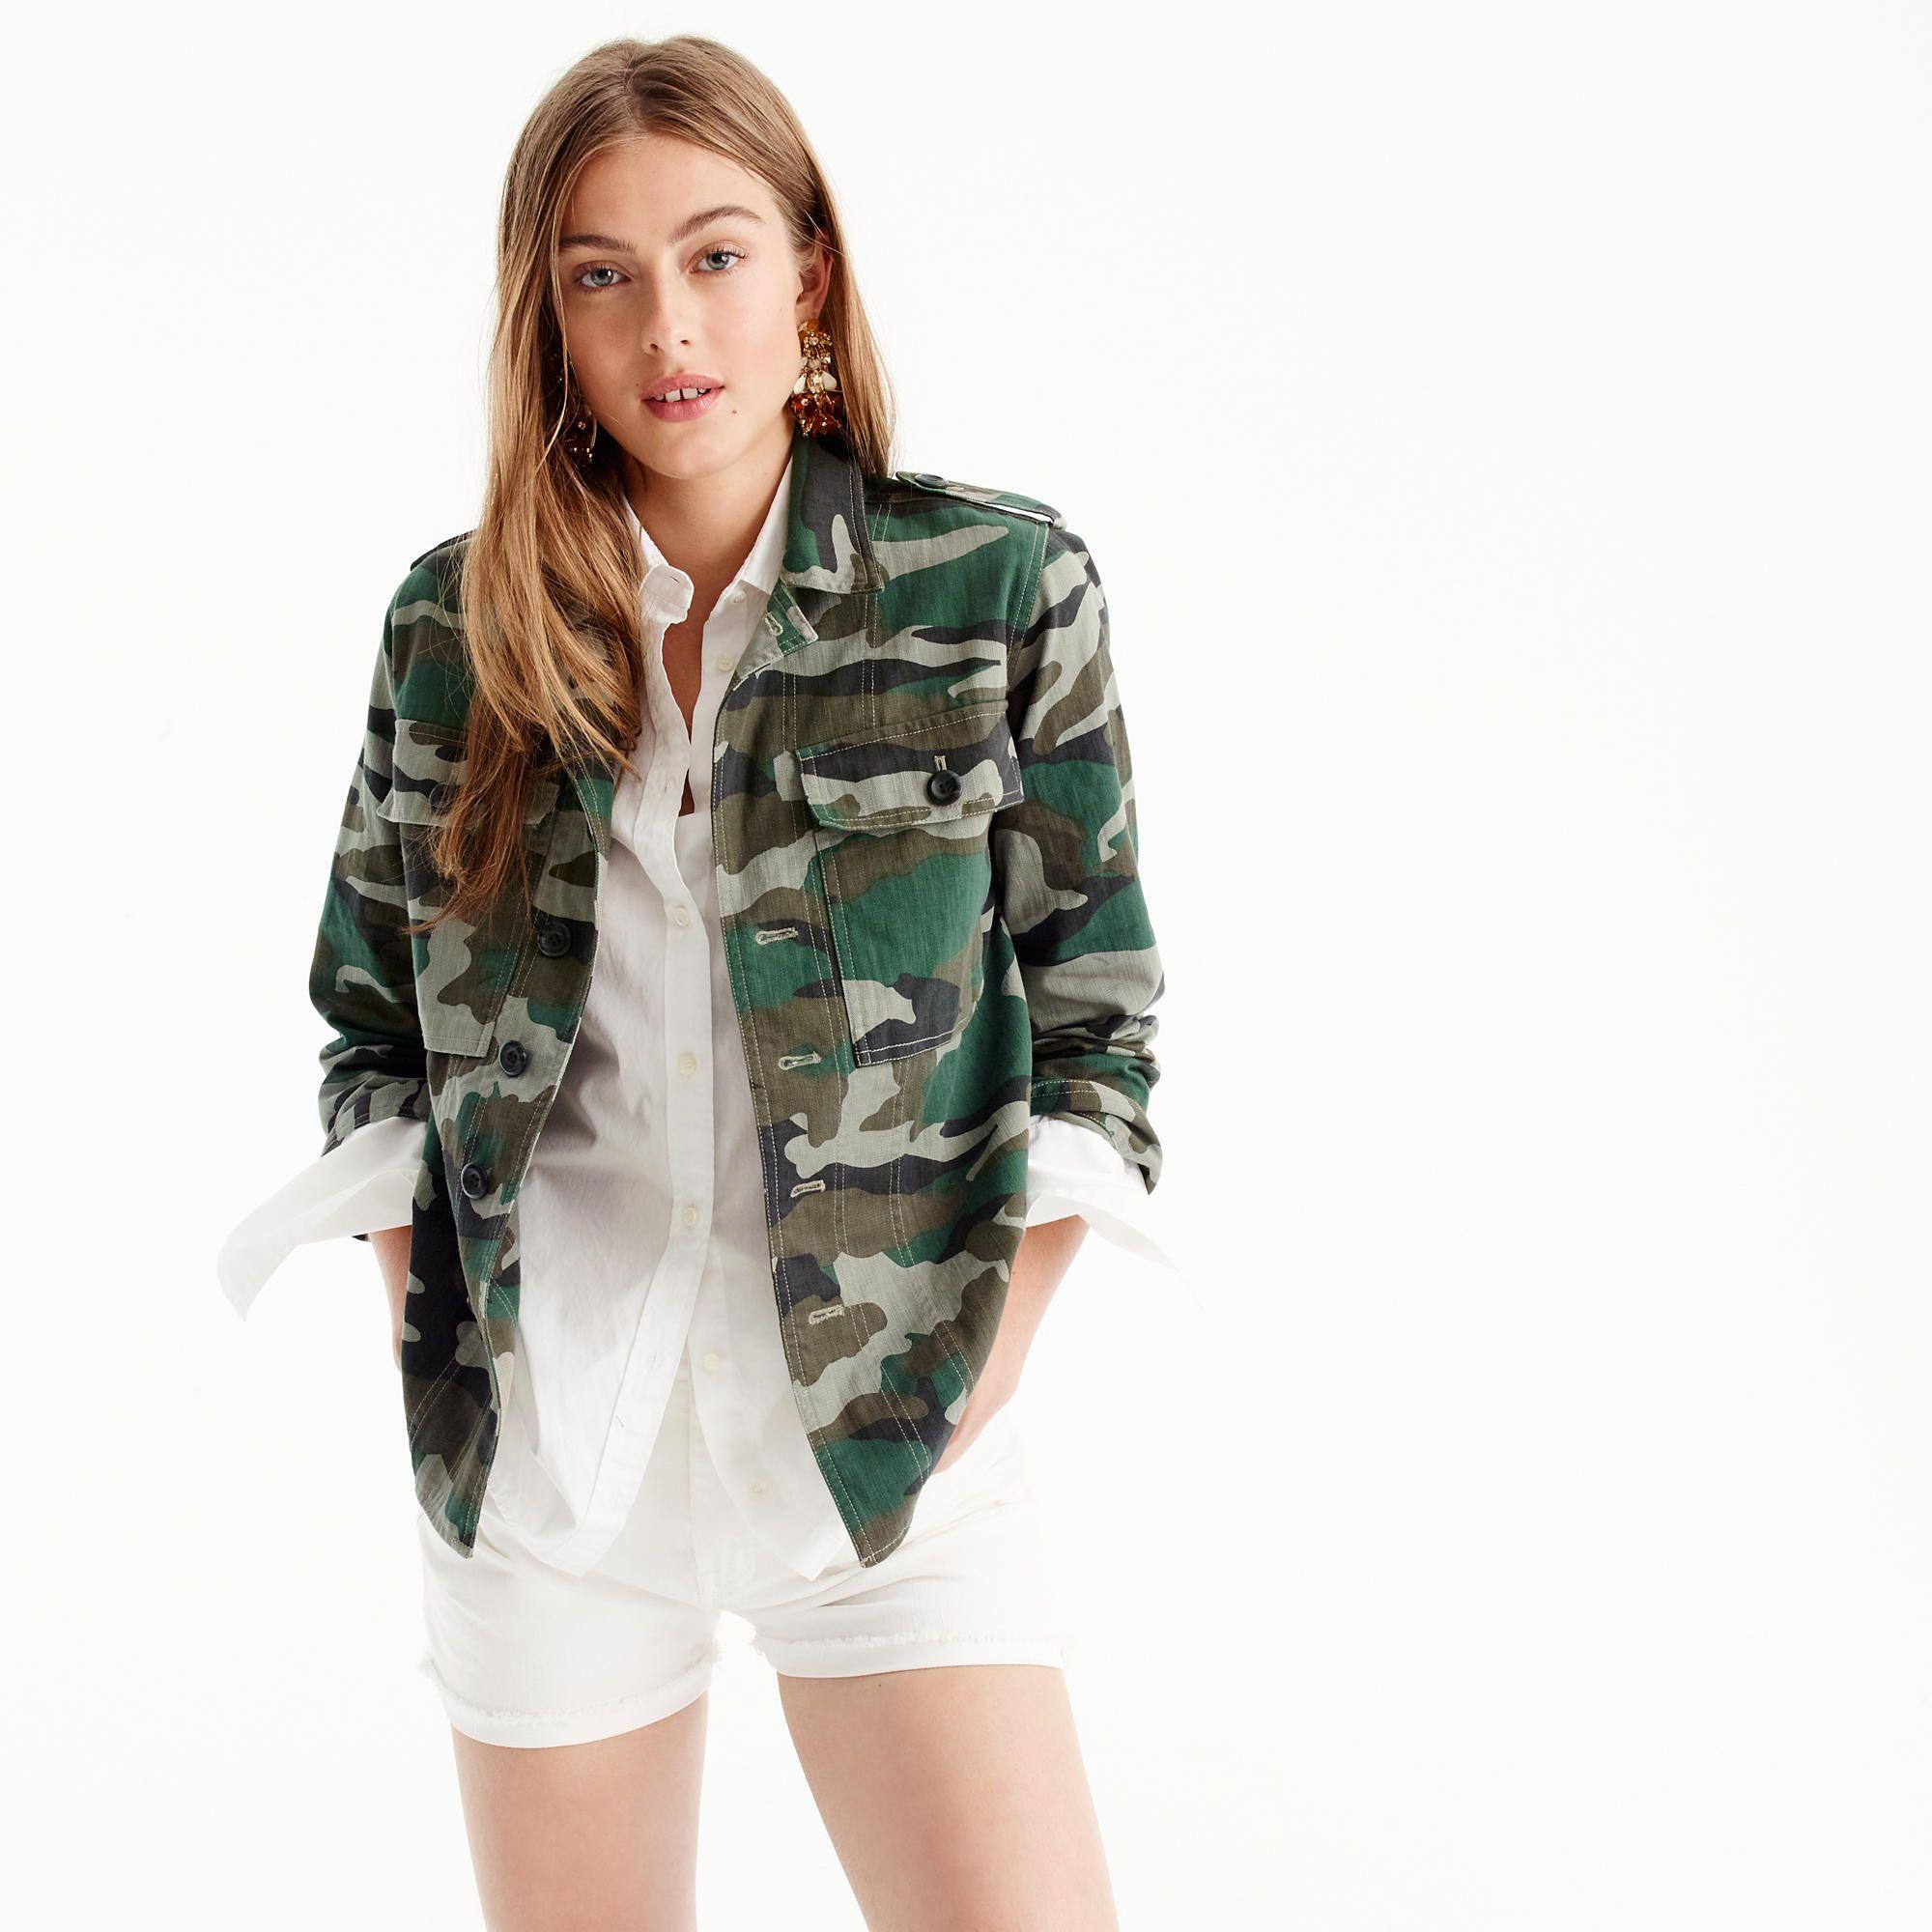 51d9ed0a38175 Camouflage utility shirt-jacket : Women cotton | J.Crew | Christmas ...